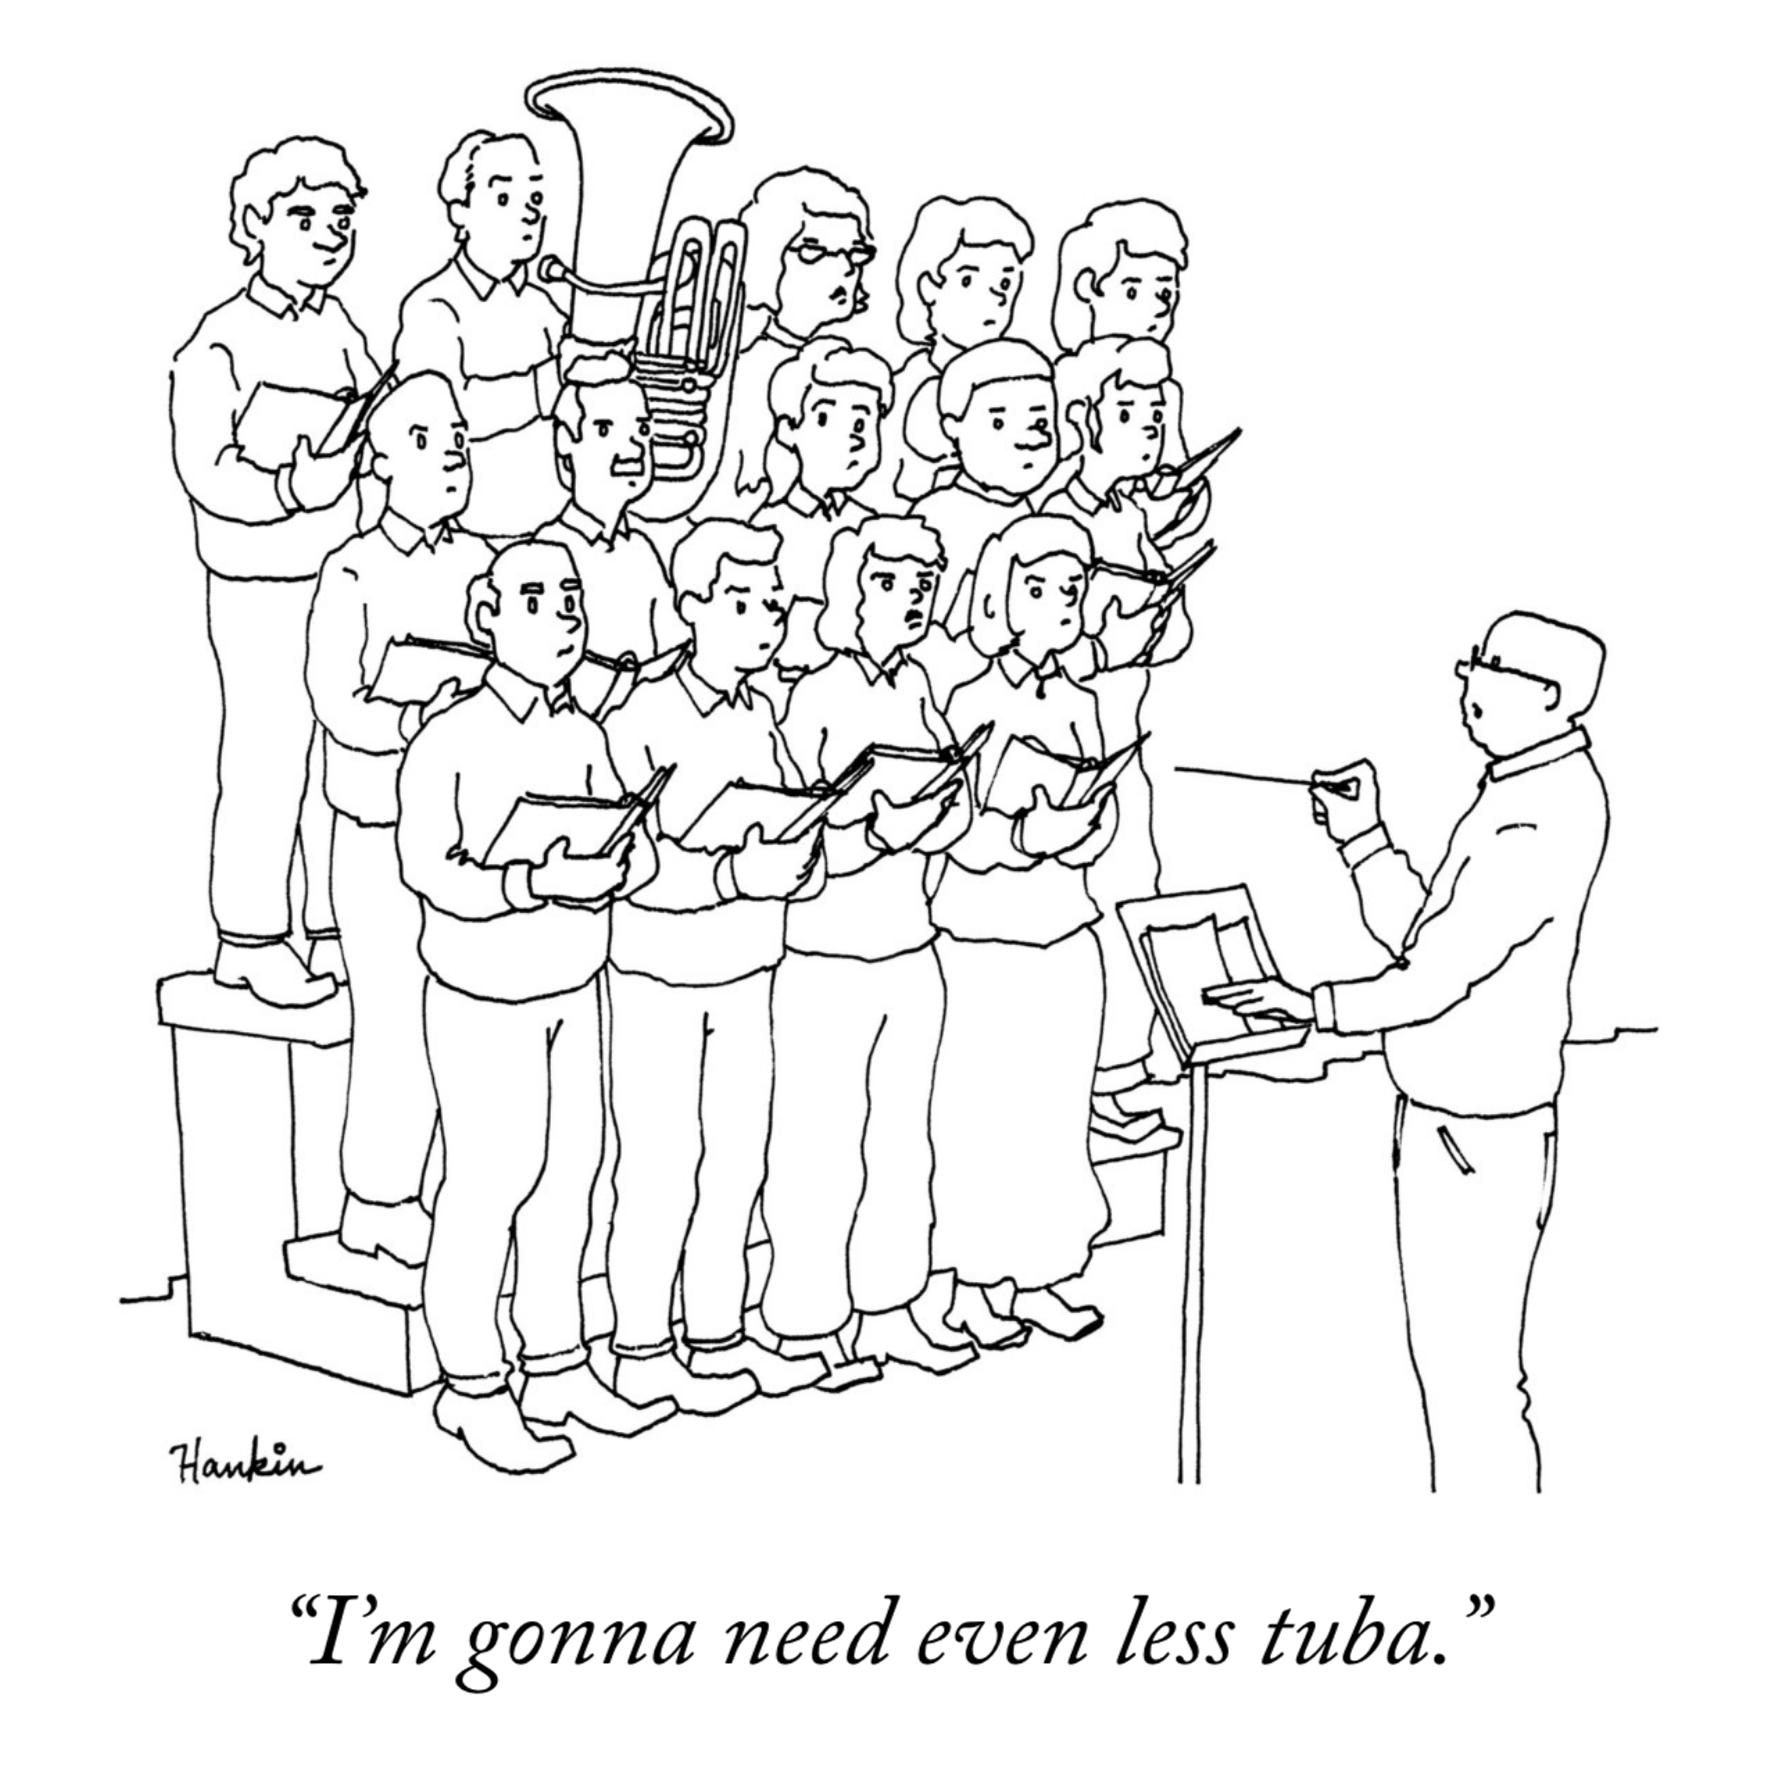 even less tuba